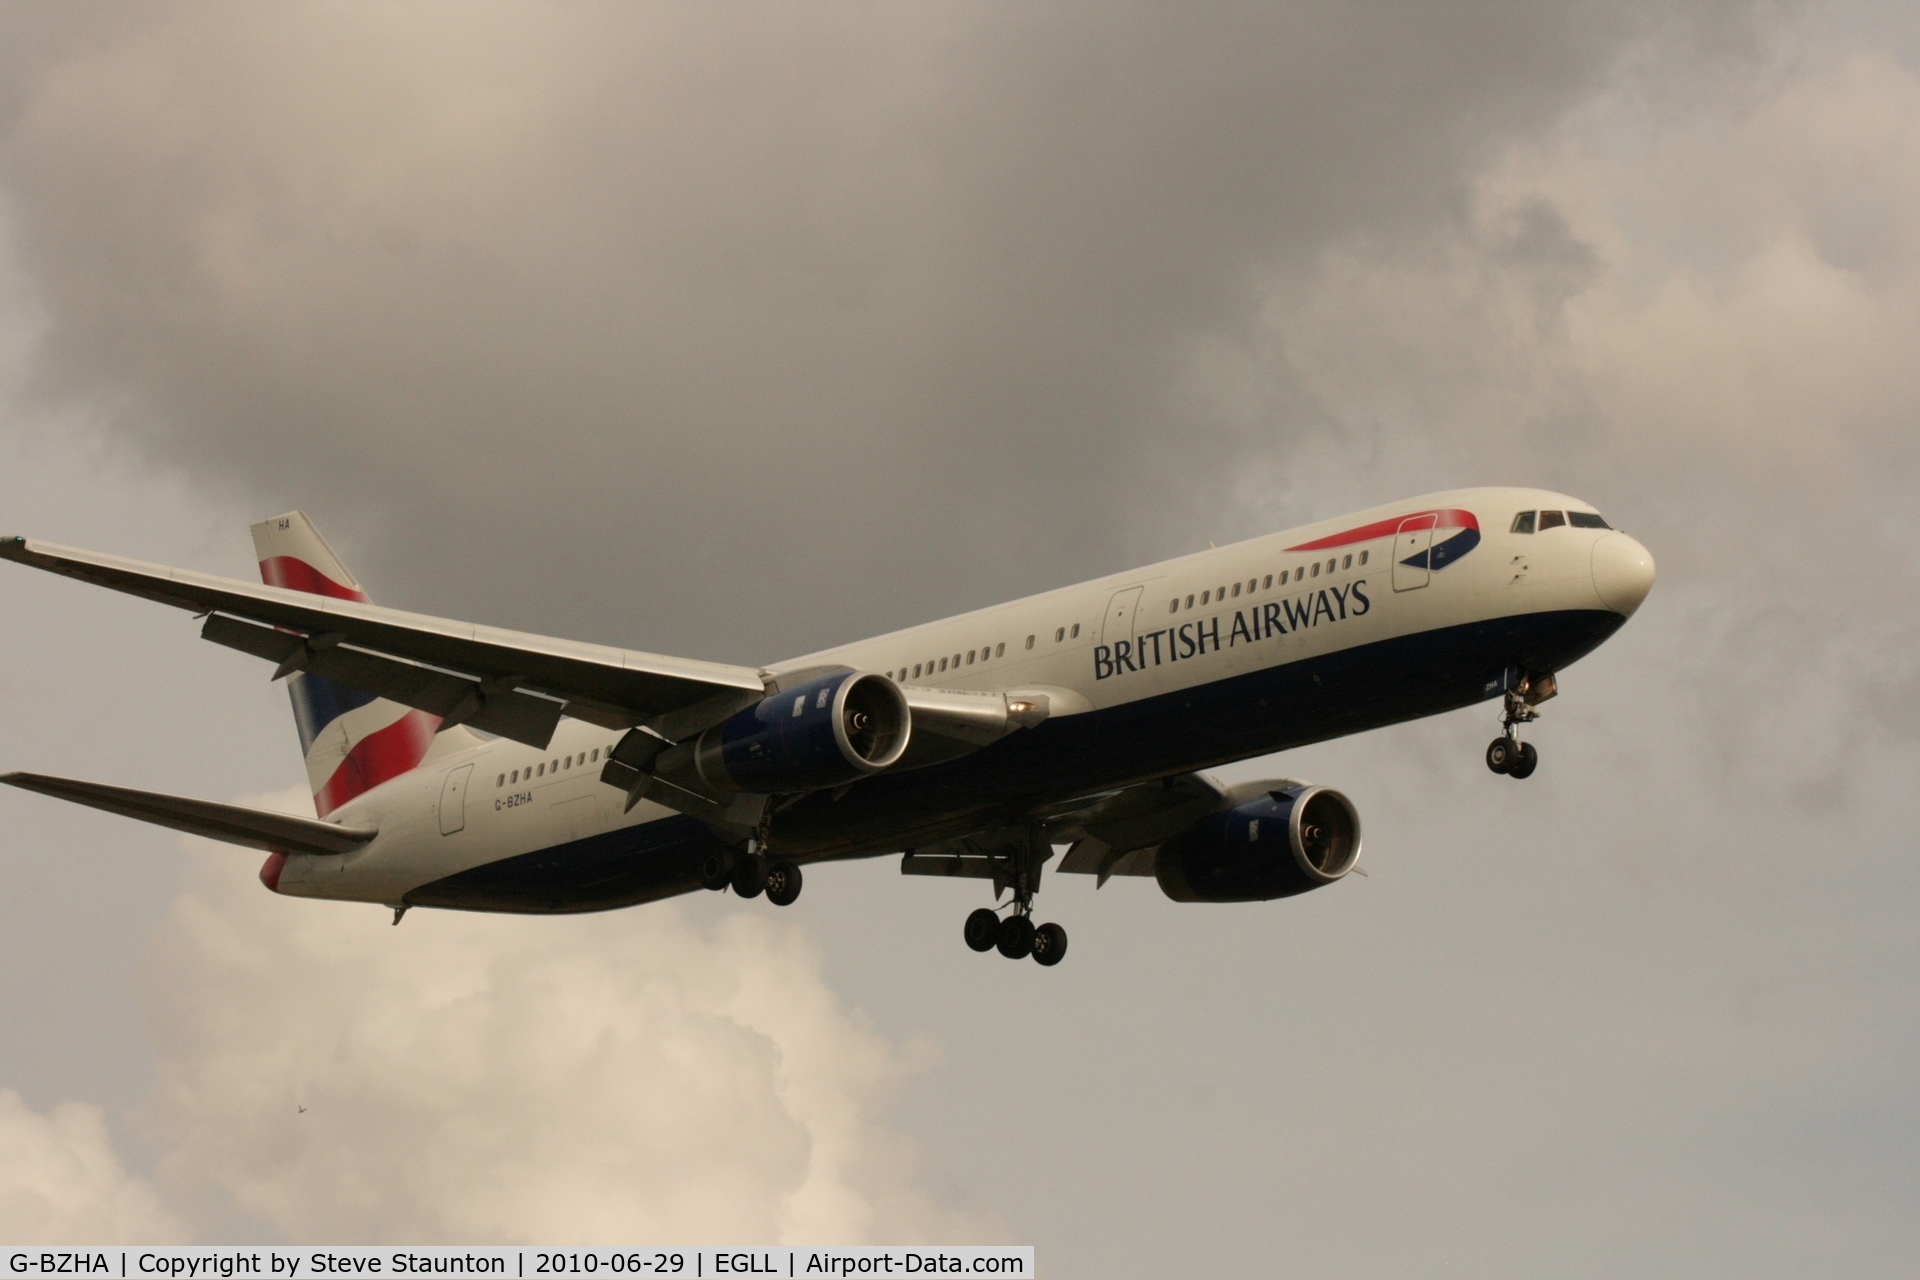 G-BZHA, 1998 Boeing 767-336 C/N 29230, Taken at Heathrow Airport, June 2010